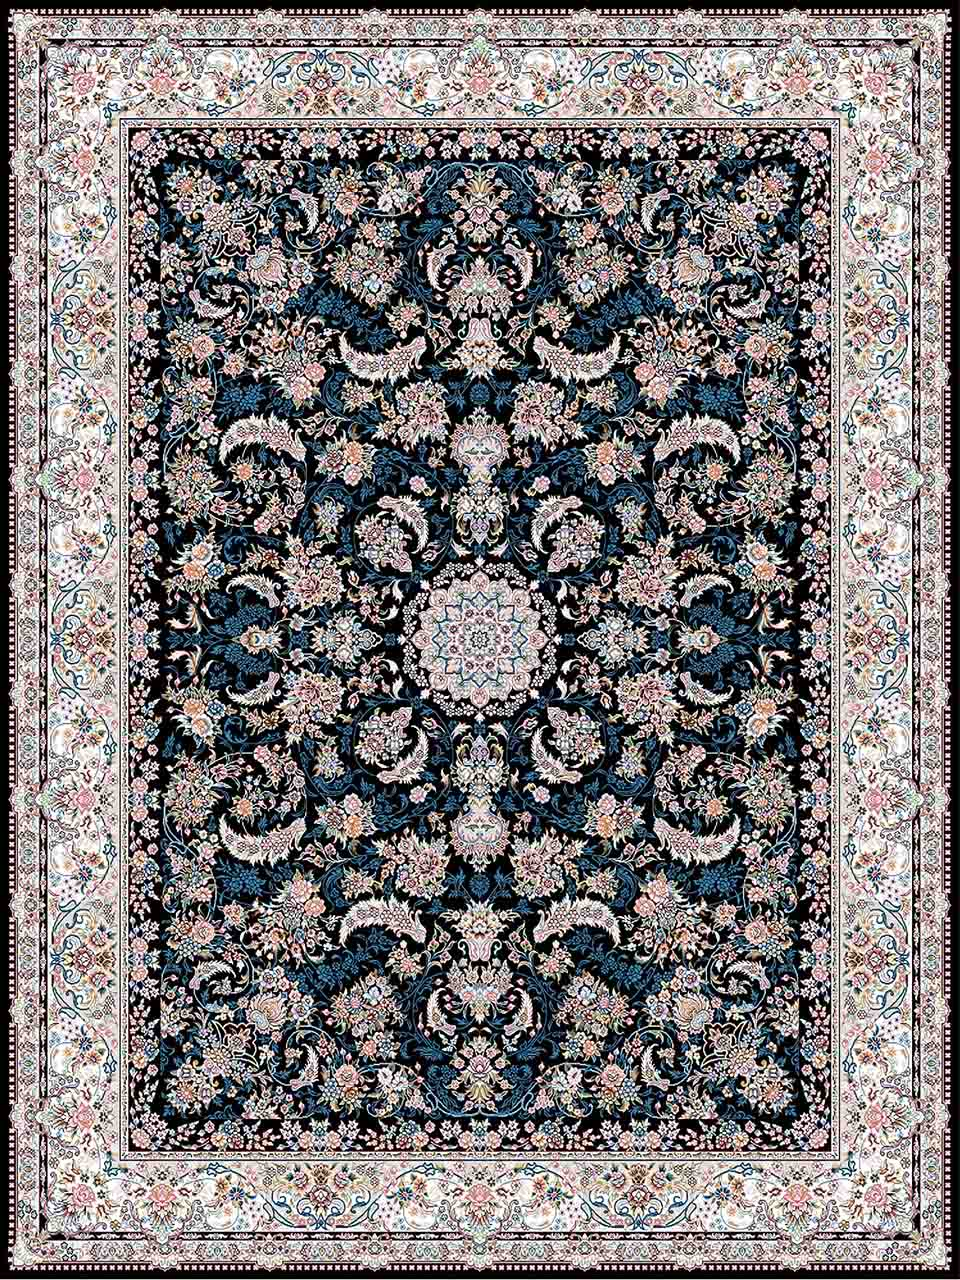 فرش (18302) اکریلیک - 8 رنگ - 500 شانه - سورمه ای- تراکم 1200